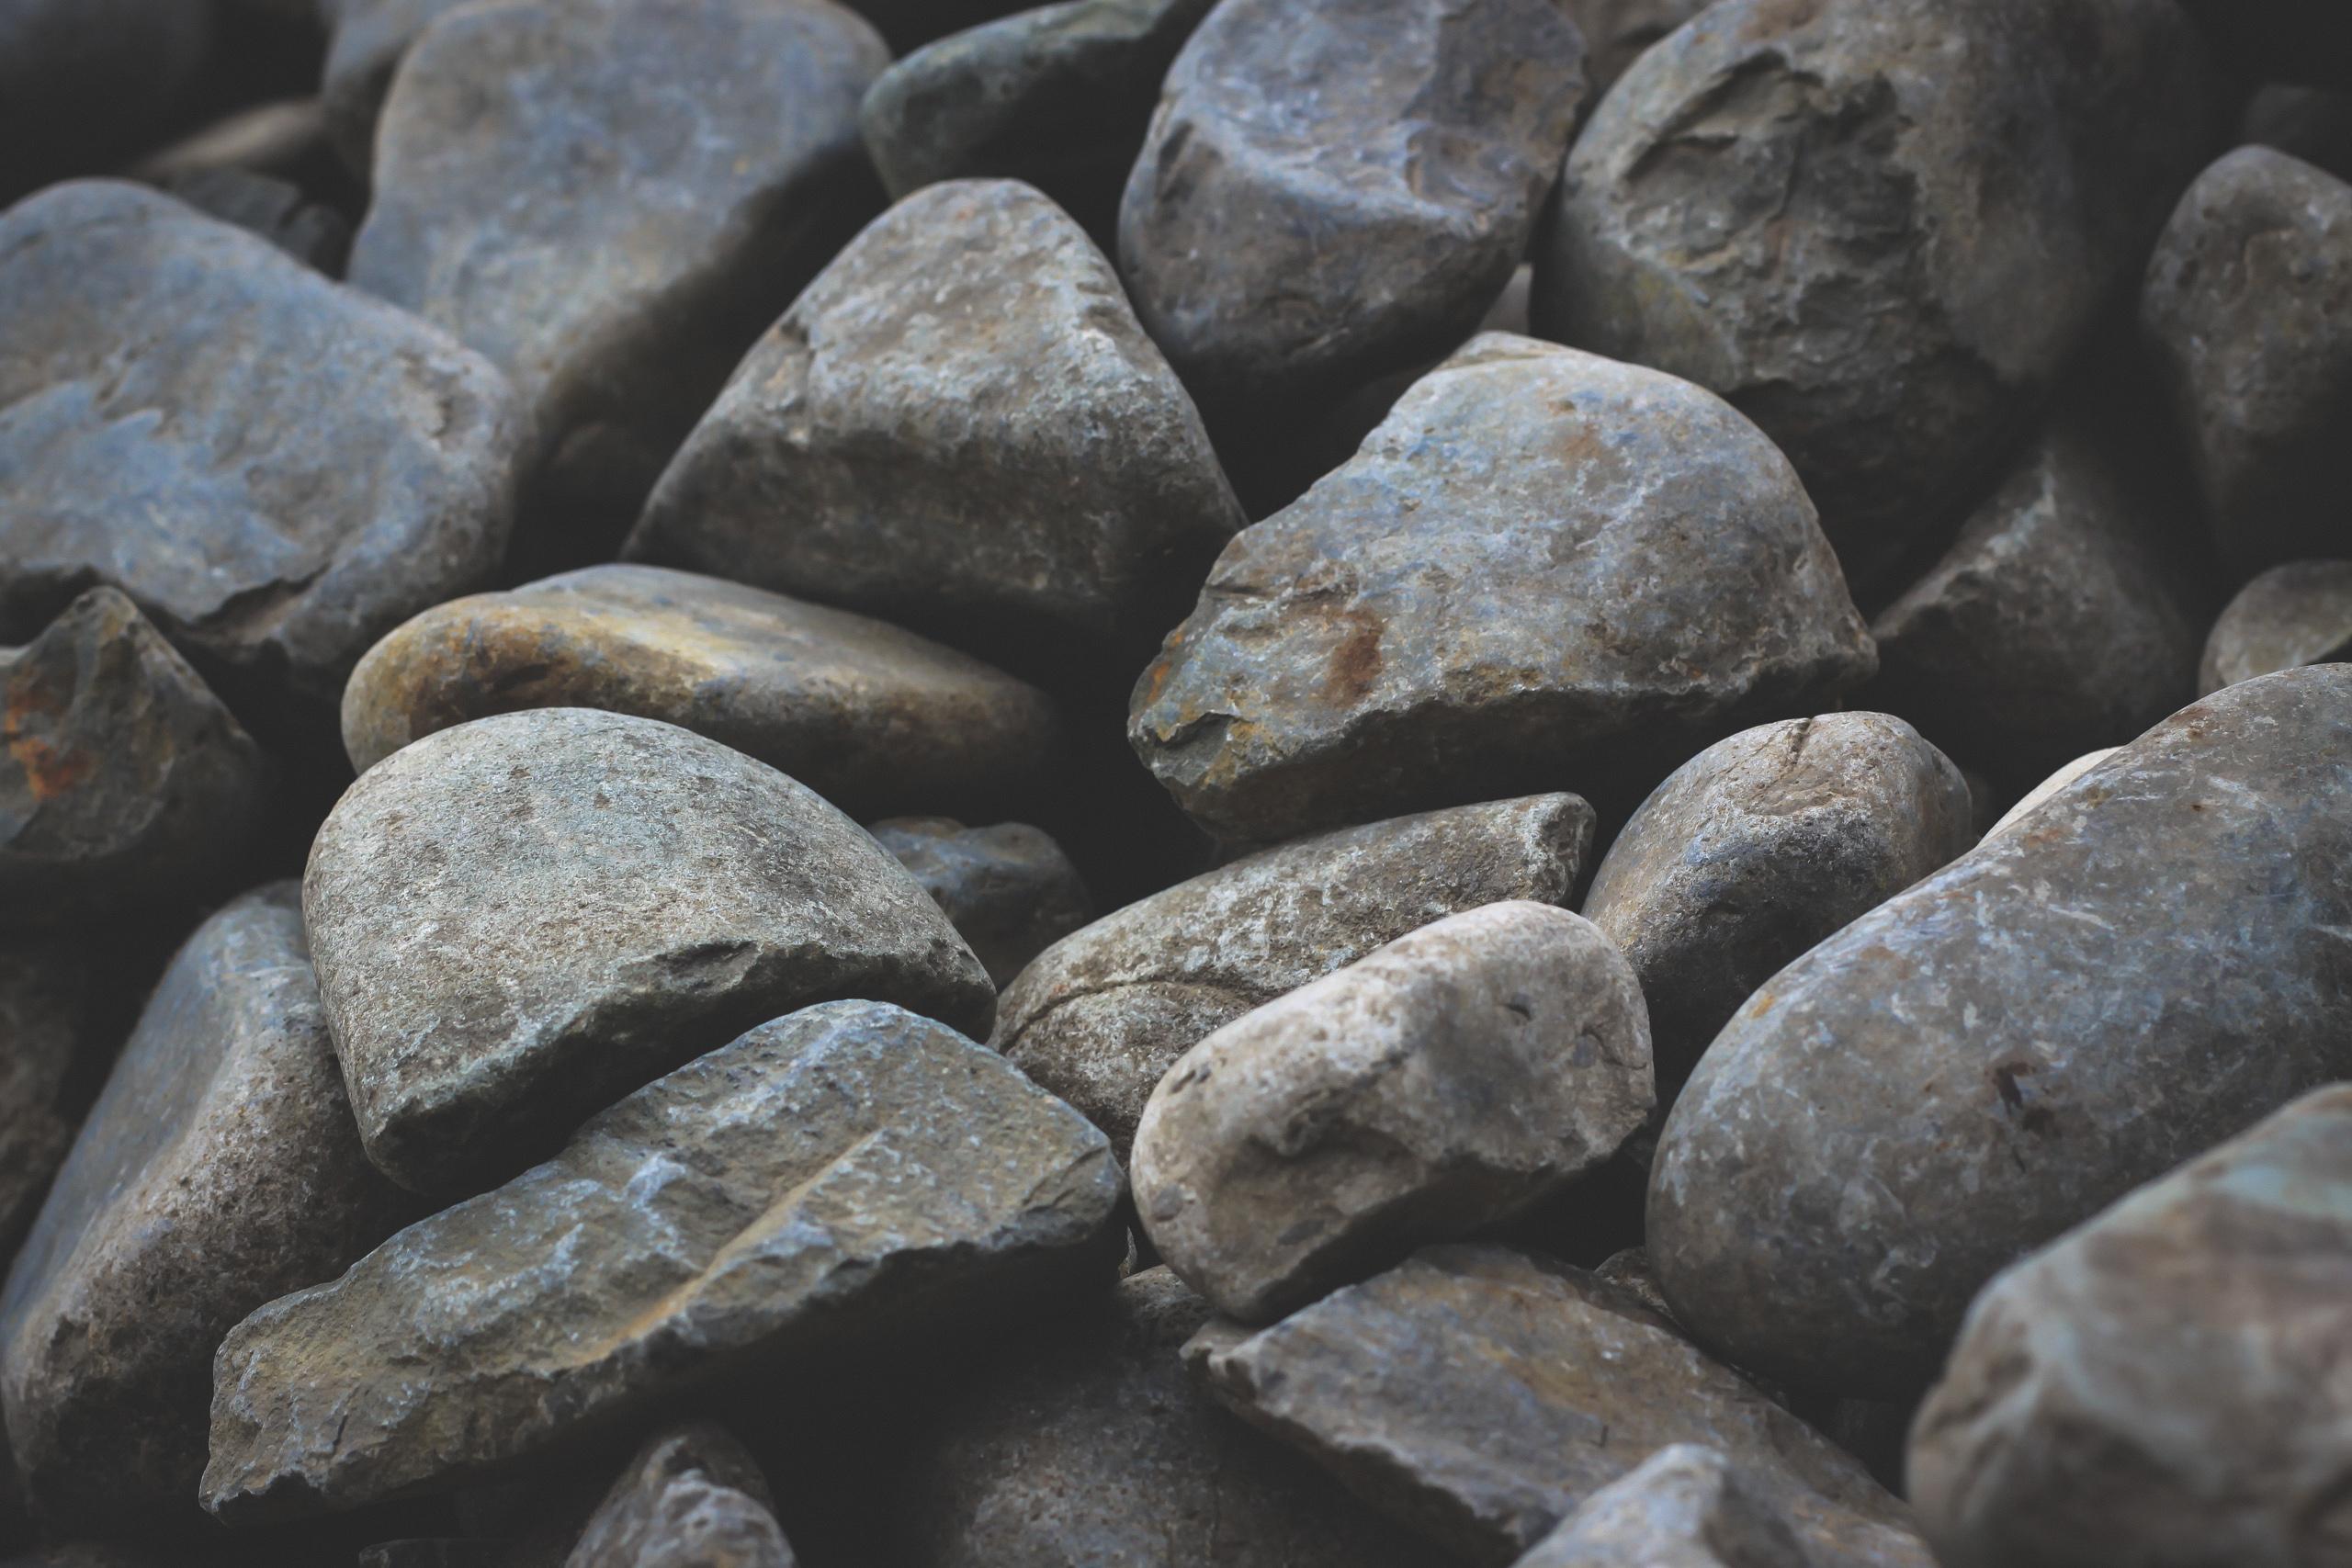 Grey River Stone Closeup Landscape Supply Photography